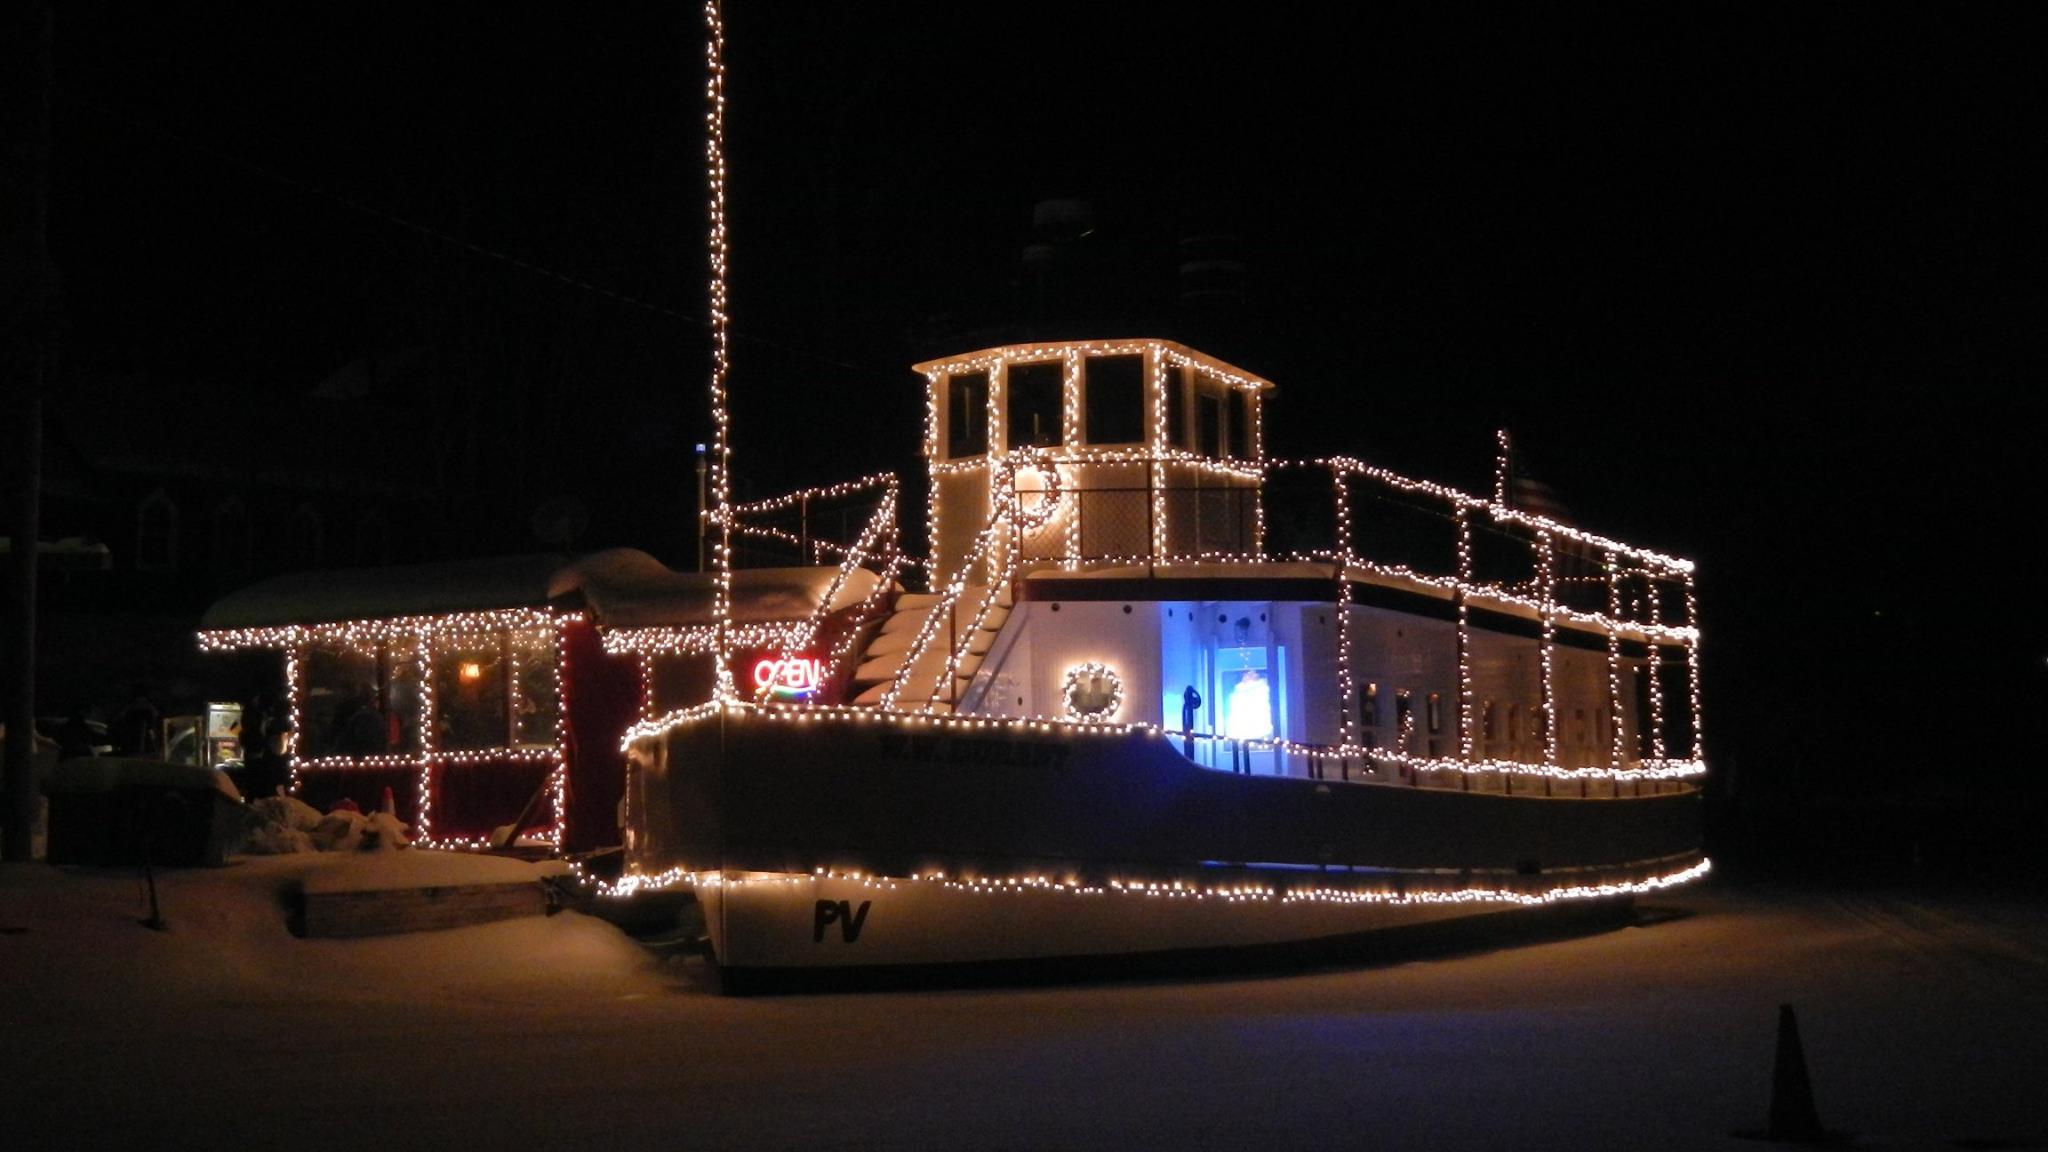 WW Durant Ice Boat at Night